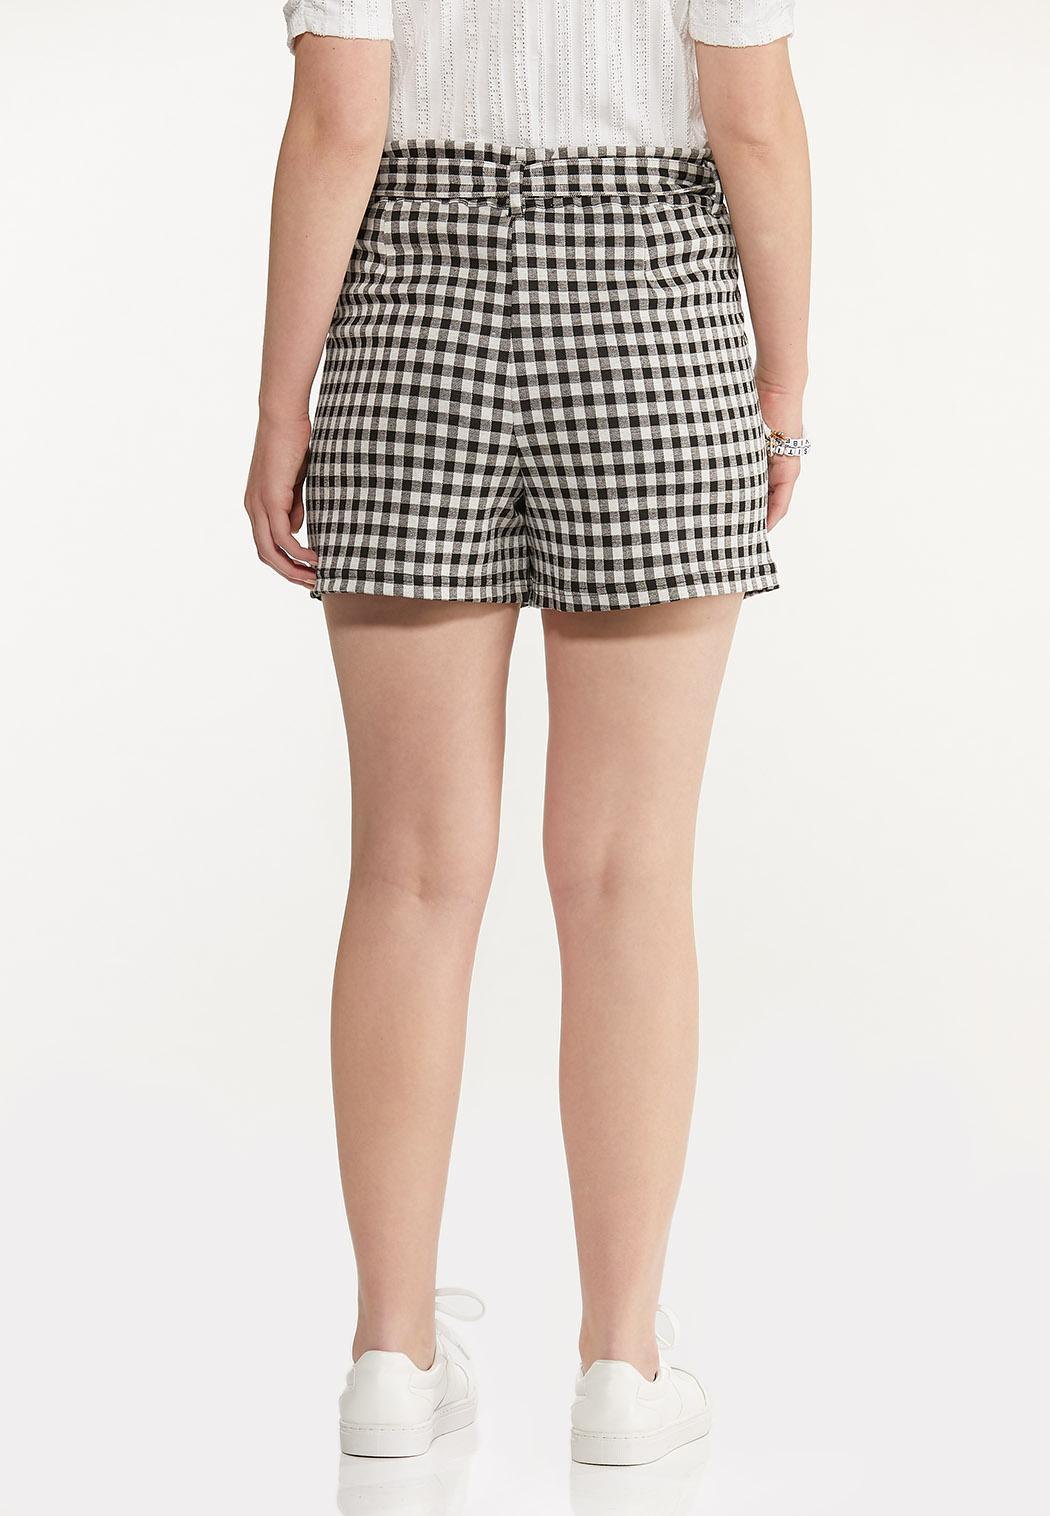 Gingham Self Tie Shorts (Item #44570132)